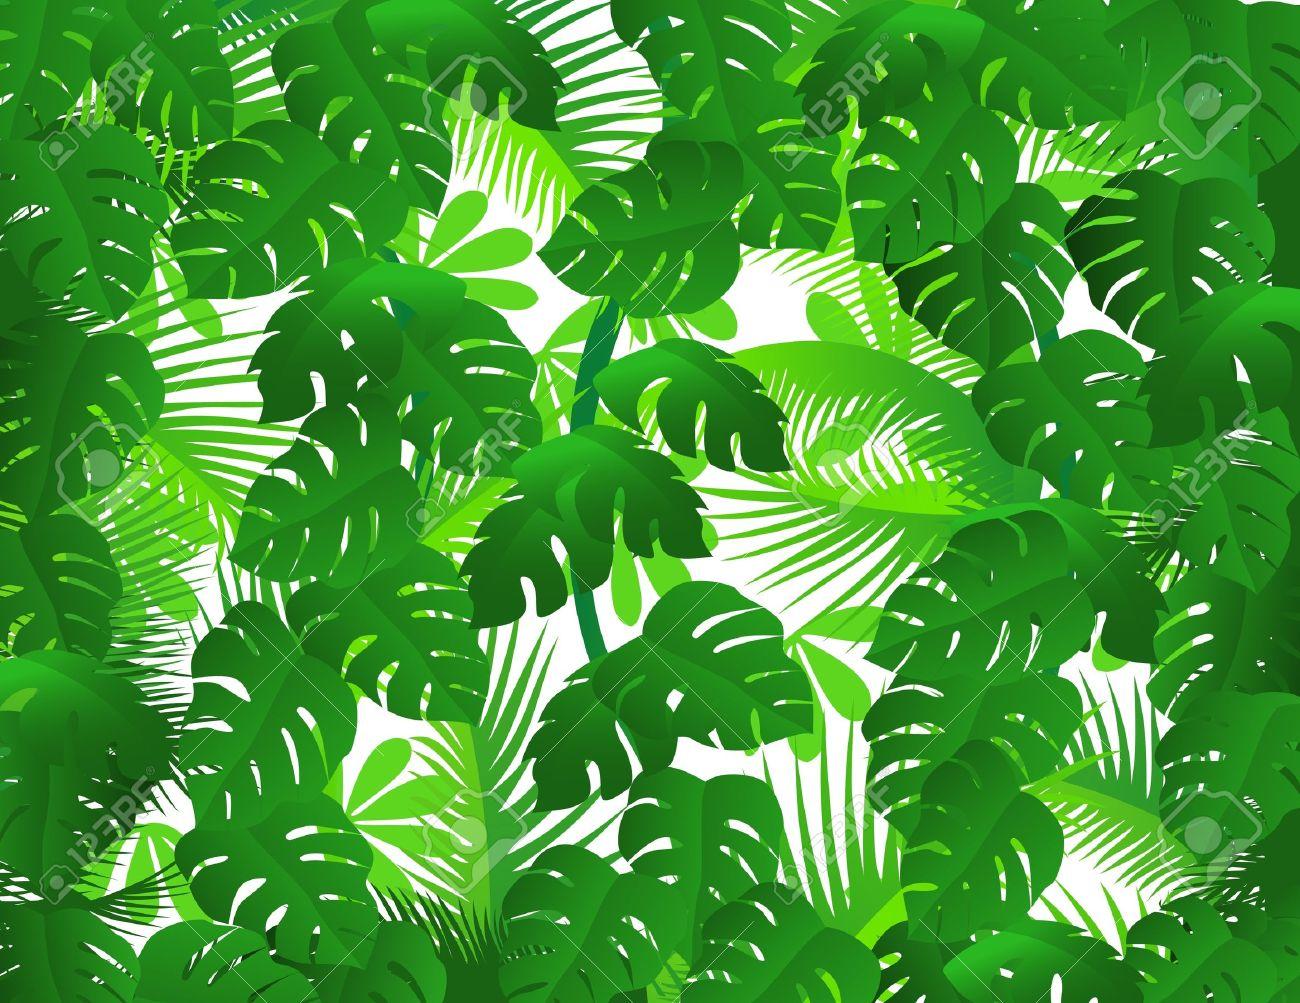 Rainforest background clipart.